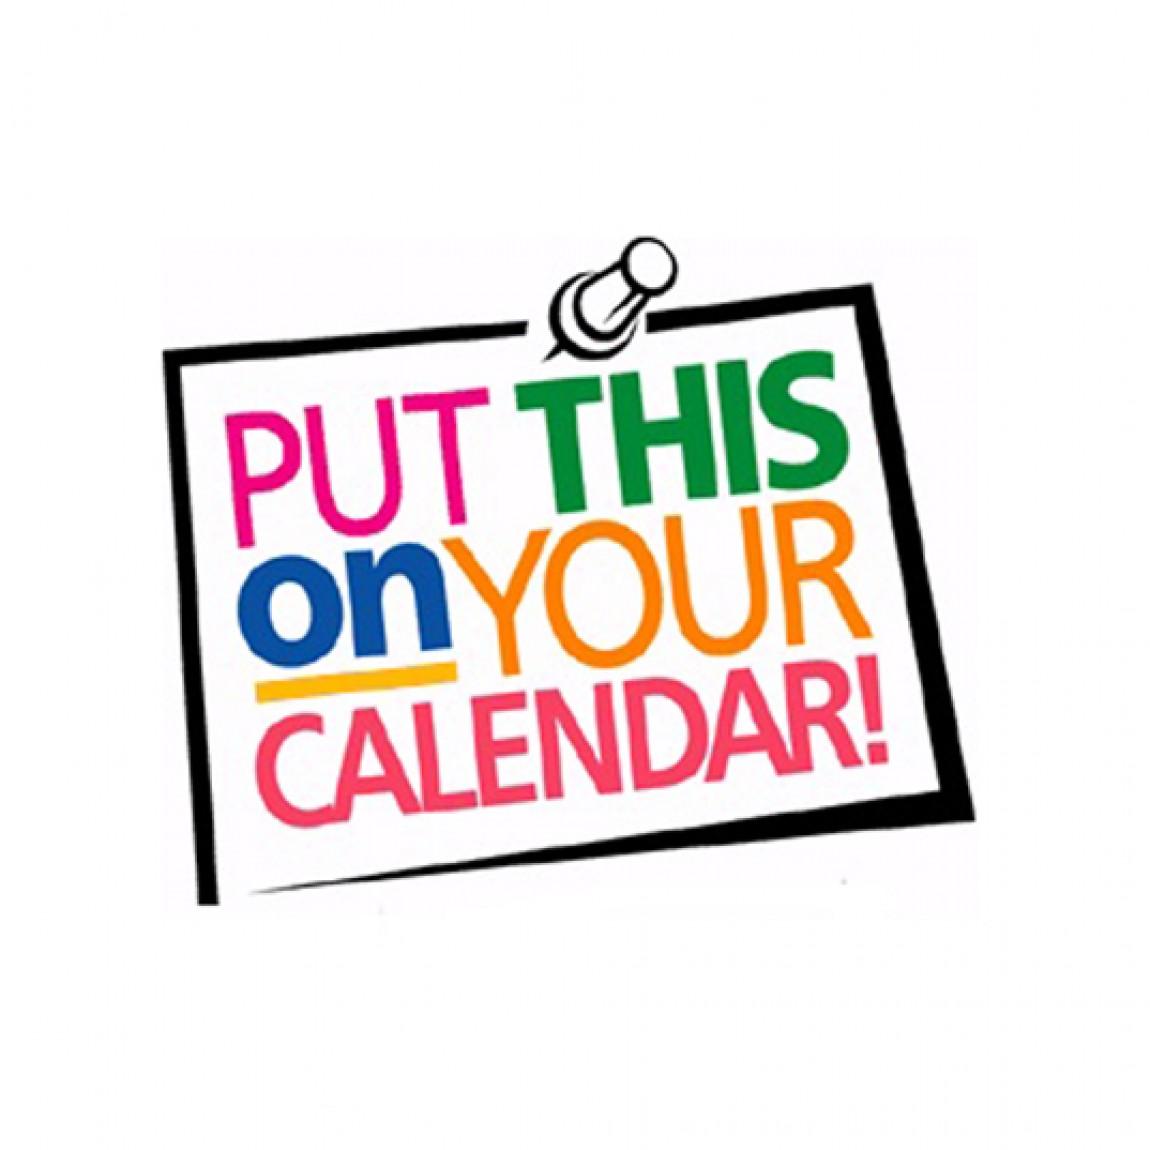 Date clipart employee meeting Development News reminder Wpb Meeting